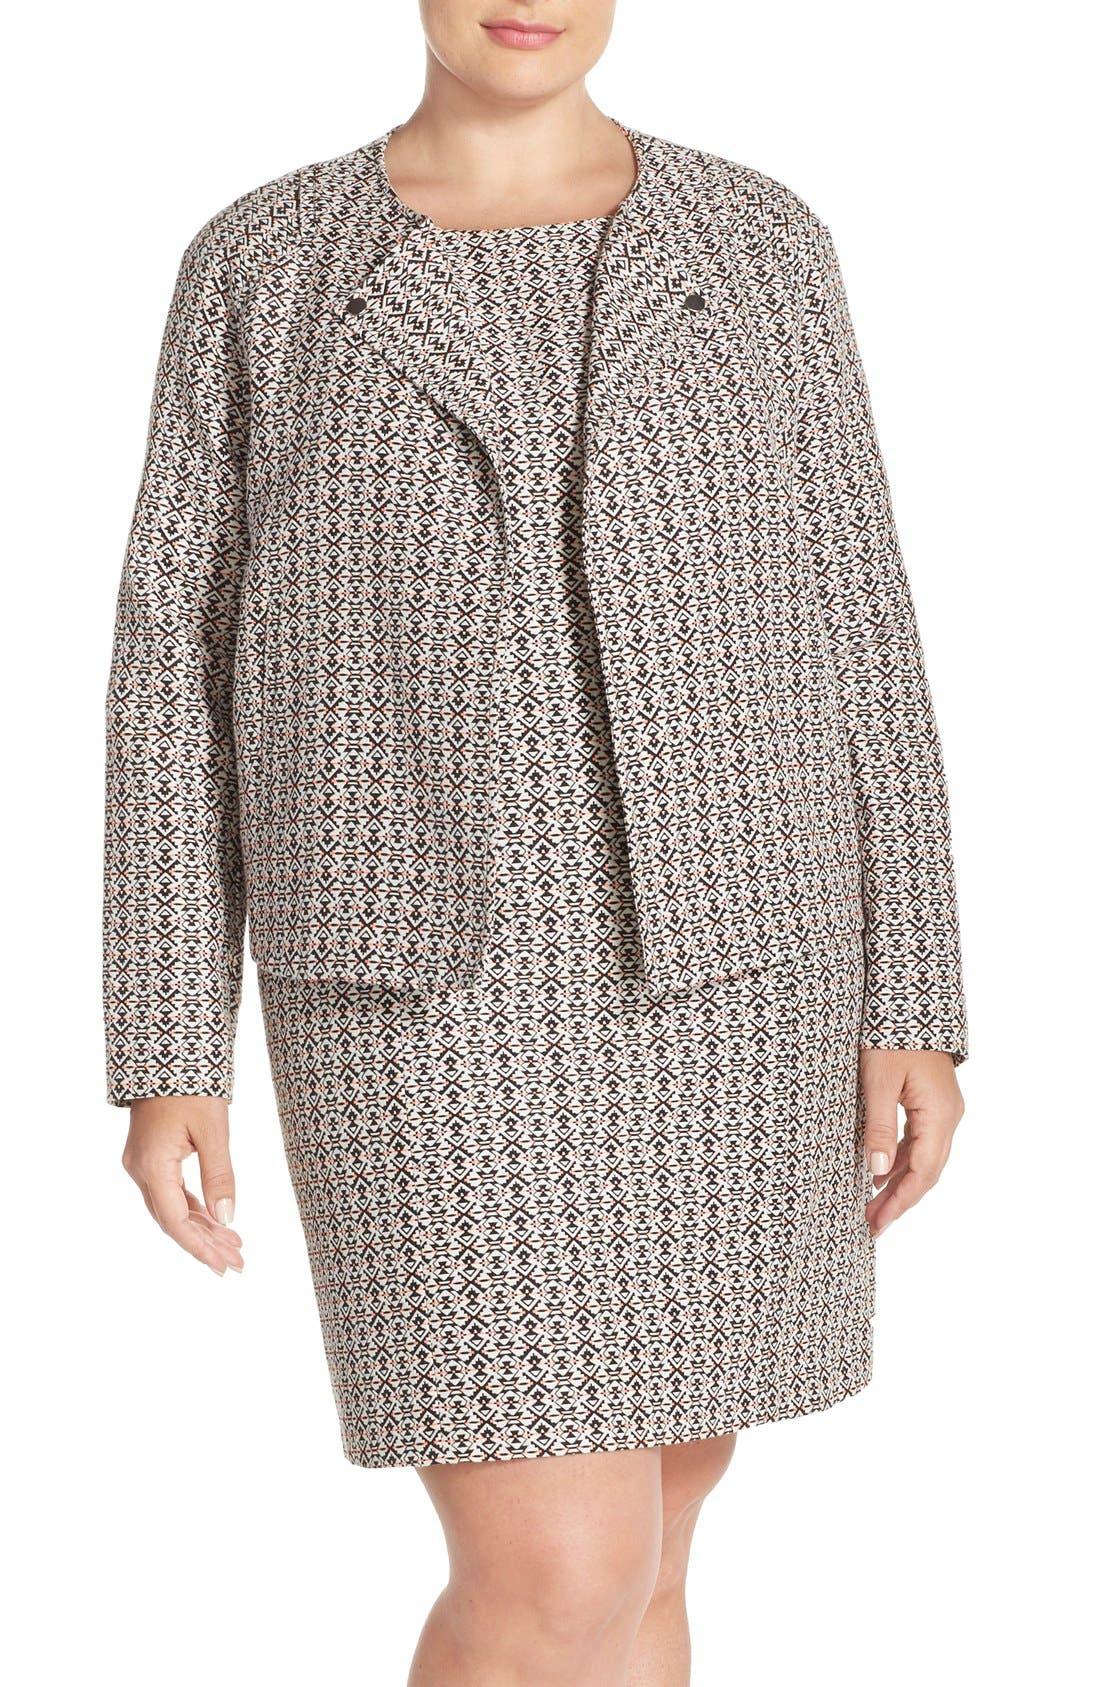 Alternate Image 1 Selected - Tart 'Aviana' Print Collarless Jacket (Plus Size)